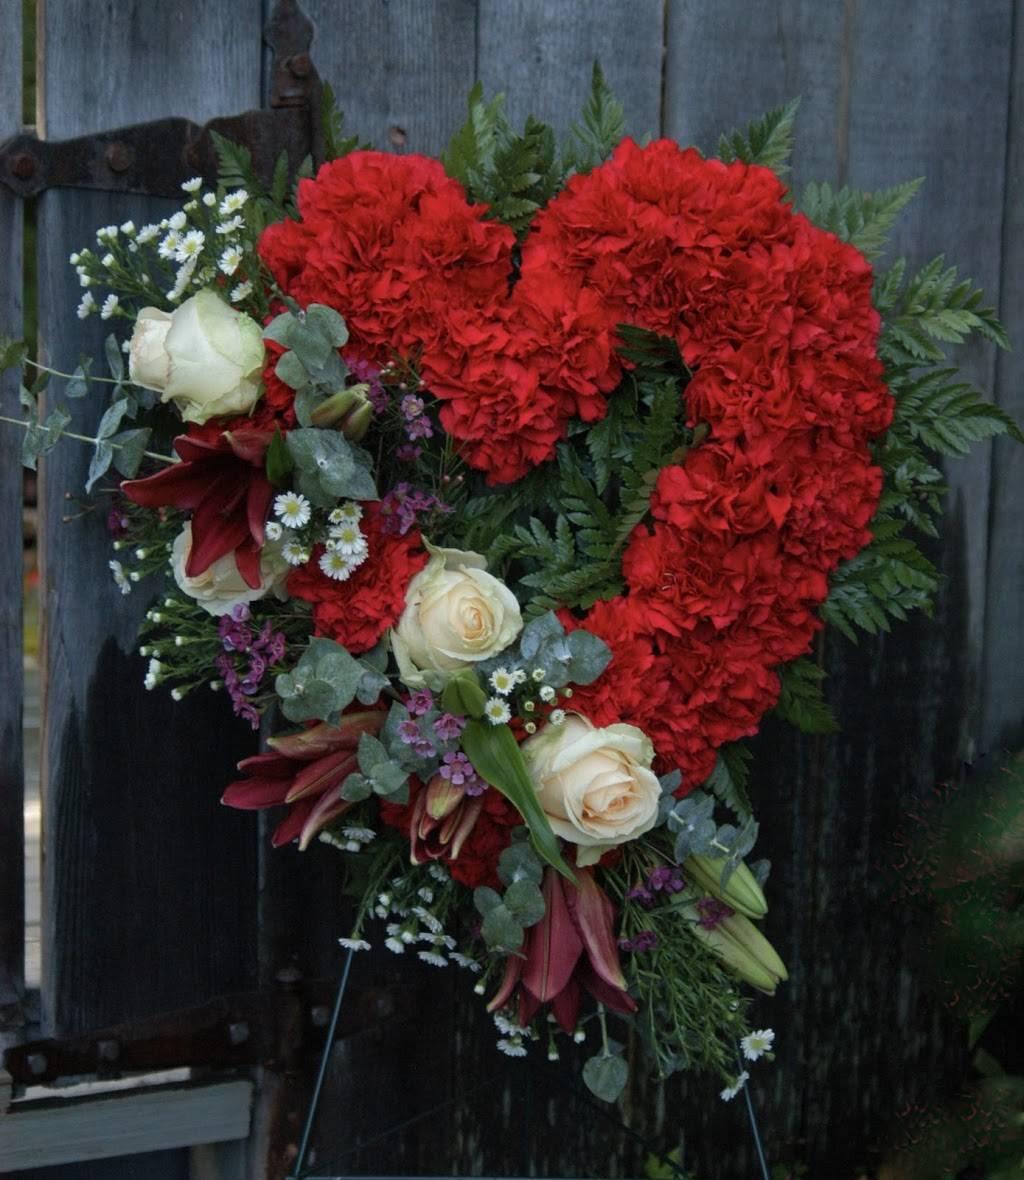 Red Carpet Flower Boutique - florist  | Photo 4 of 8 | Address: 12611 Landmark Ct unit b, Anchorage, AK 99515, USA | Phone: (907) 350-9792